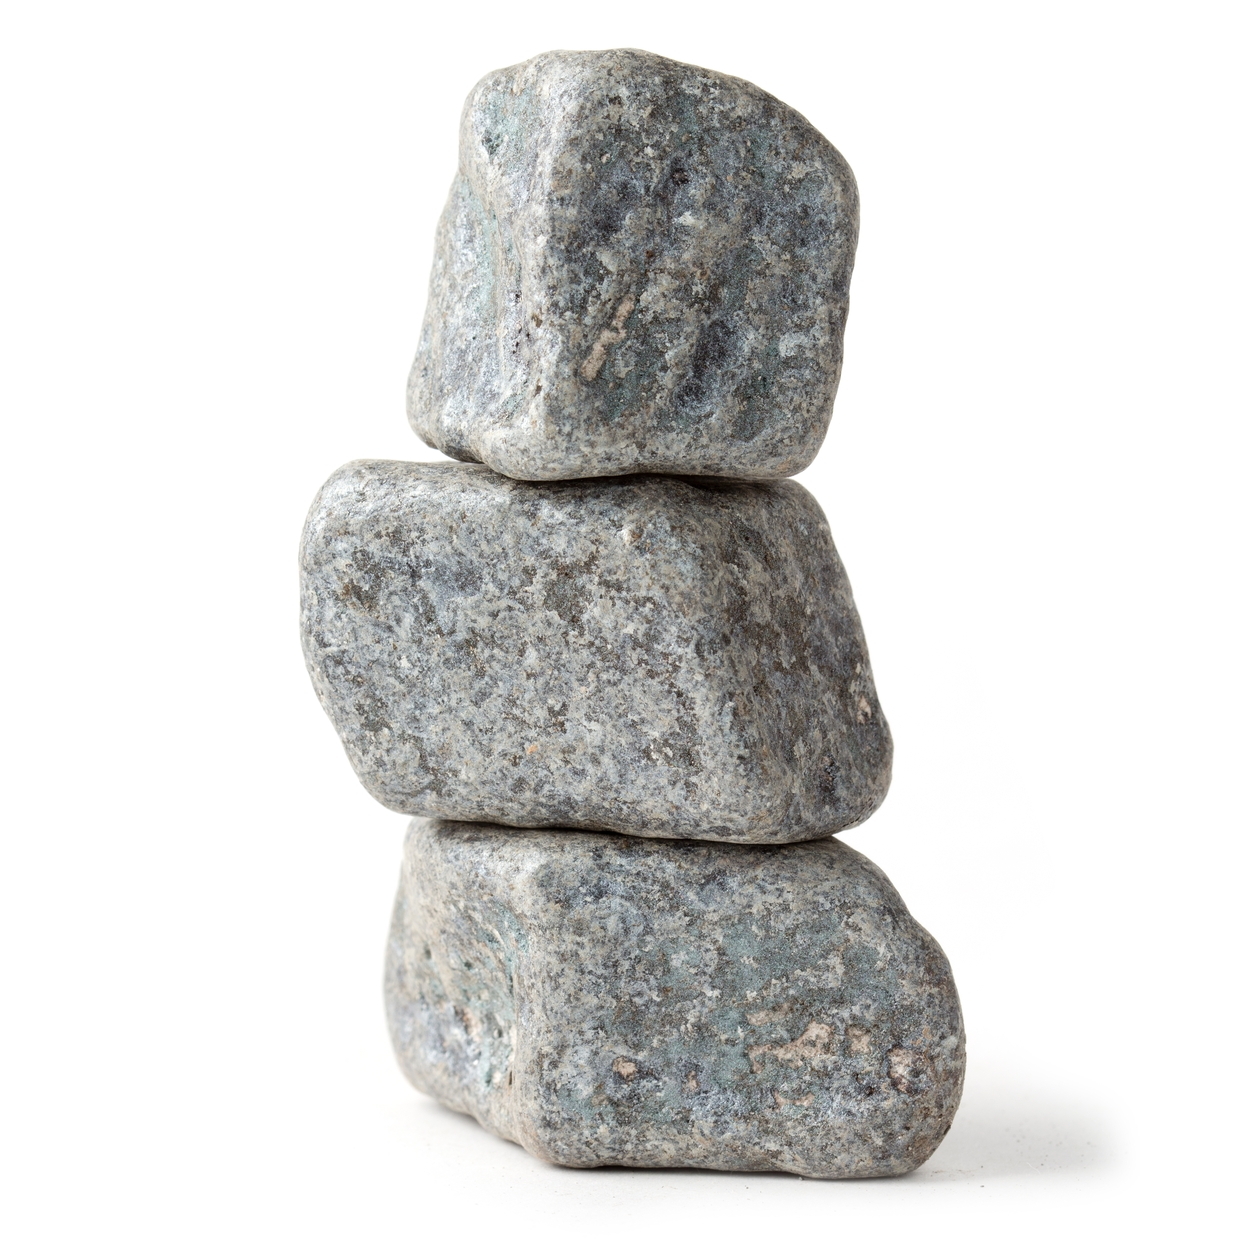 Silver Chocolate Rocks Boulders - 5 LB Bag • Chocolate Candy ...